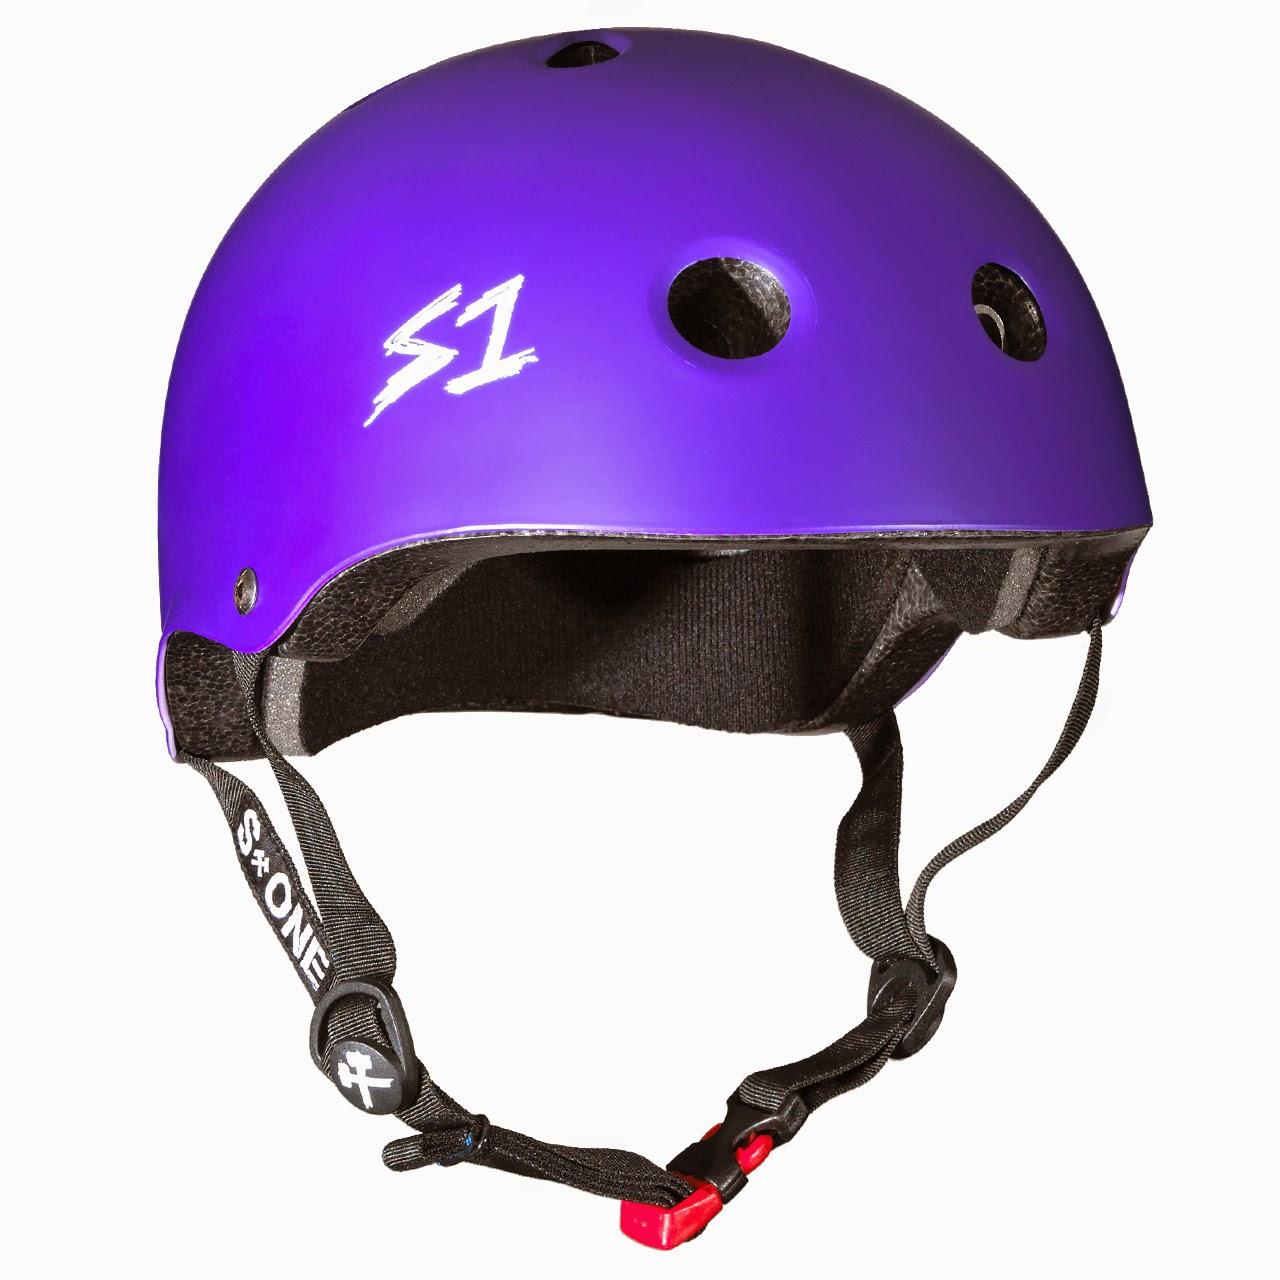 helmet s1 purple skate helmets mini lifer matte kid gear 3ride bmx womens required tweet heads